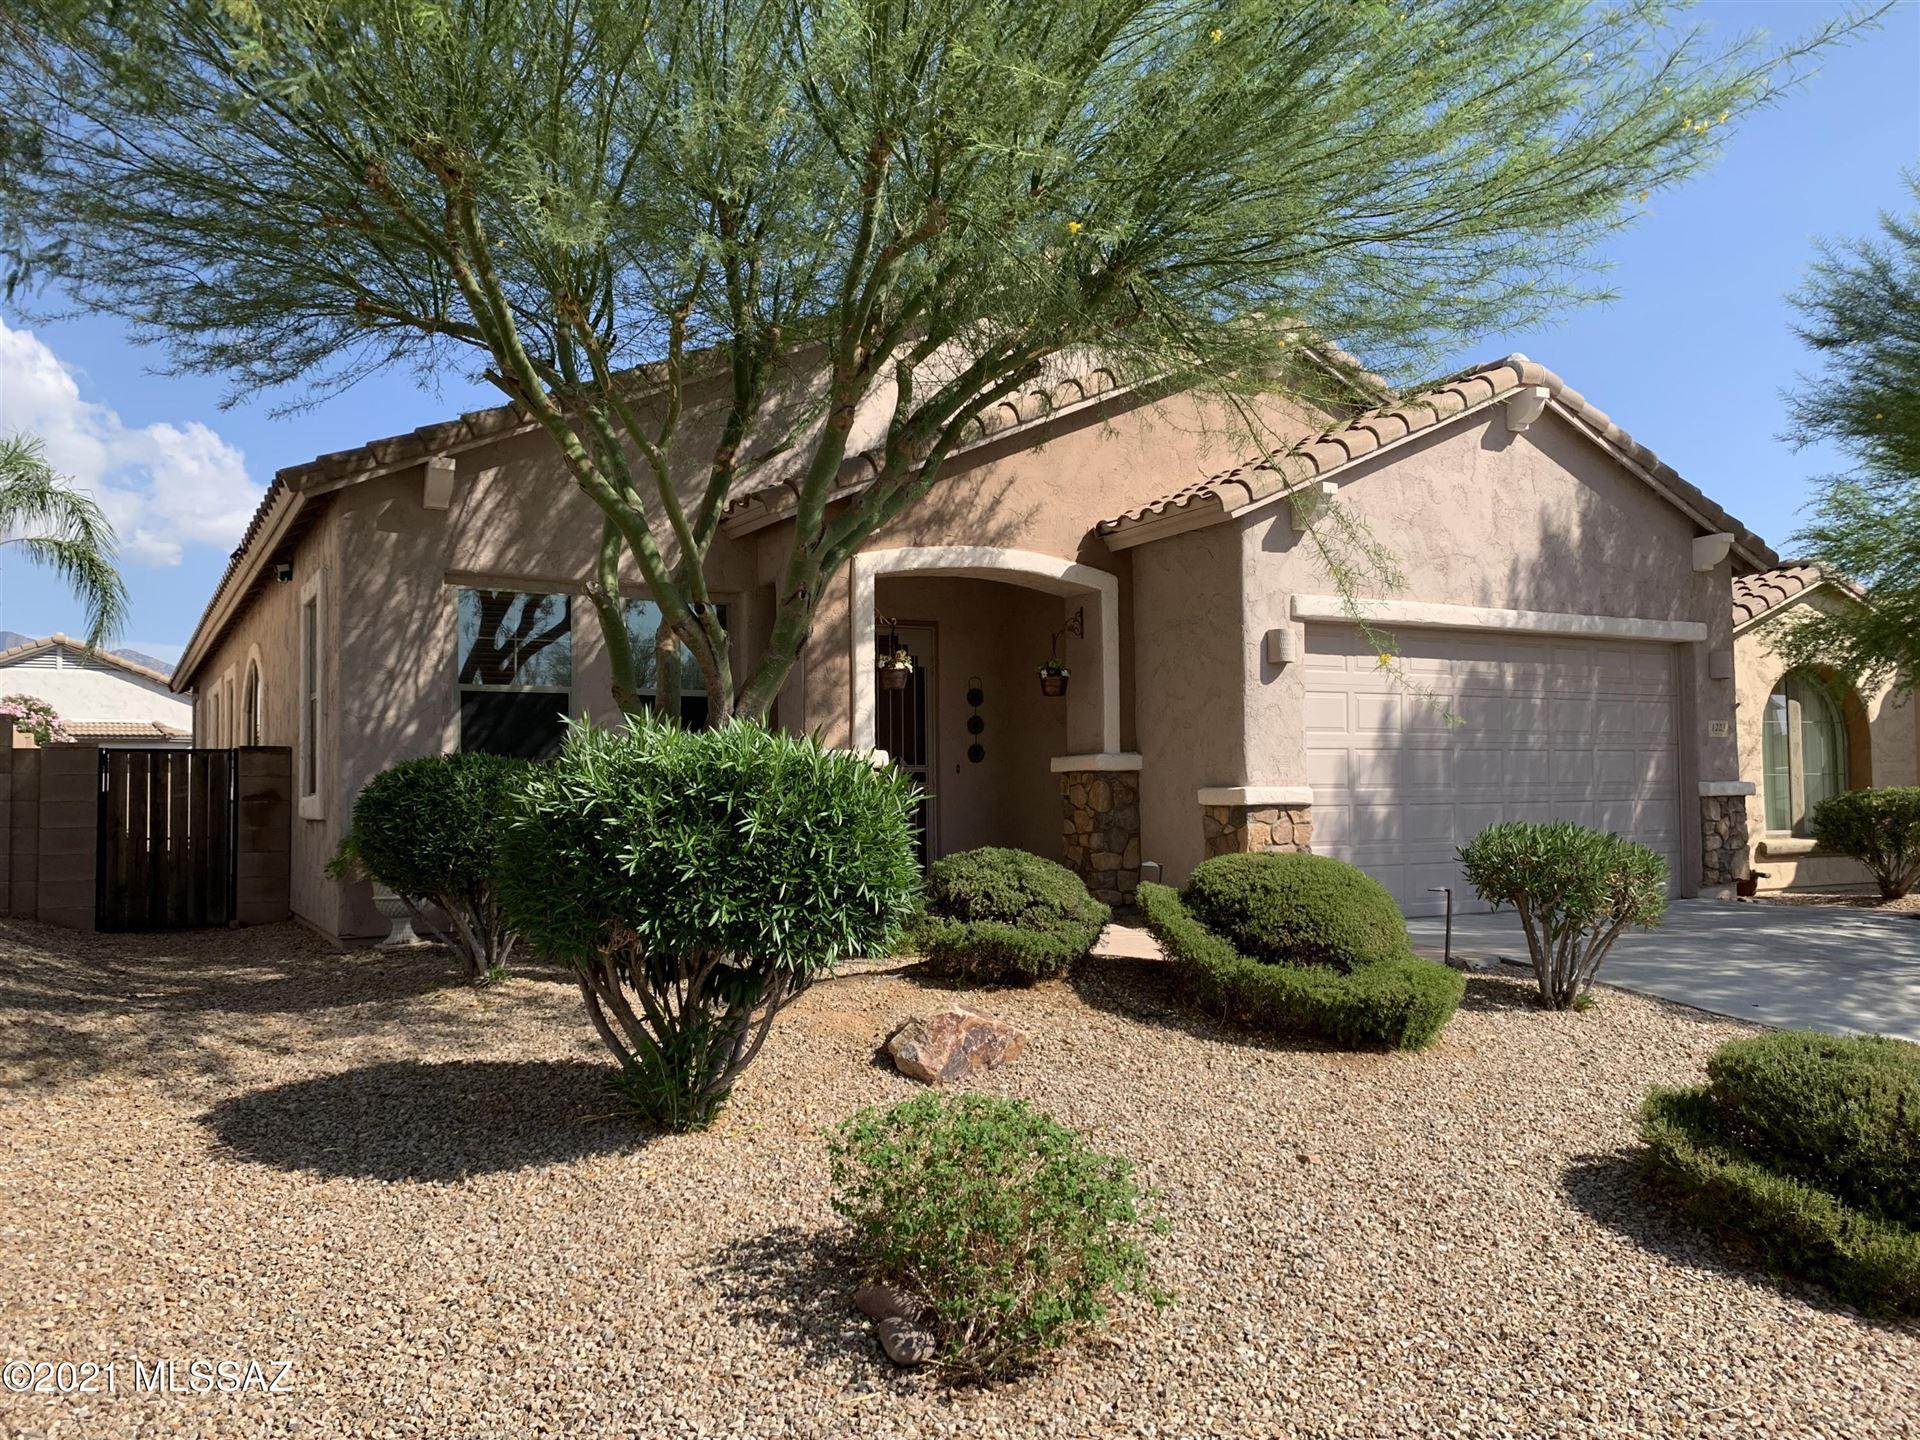 1223 W Faldo Drive, Oro Valley, AZ 85755 - MLS#: 22118593